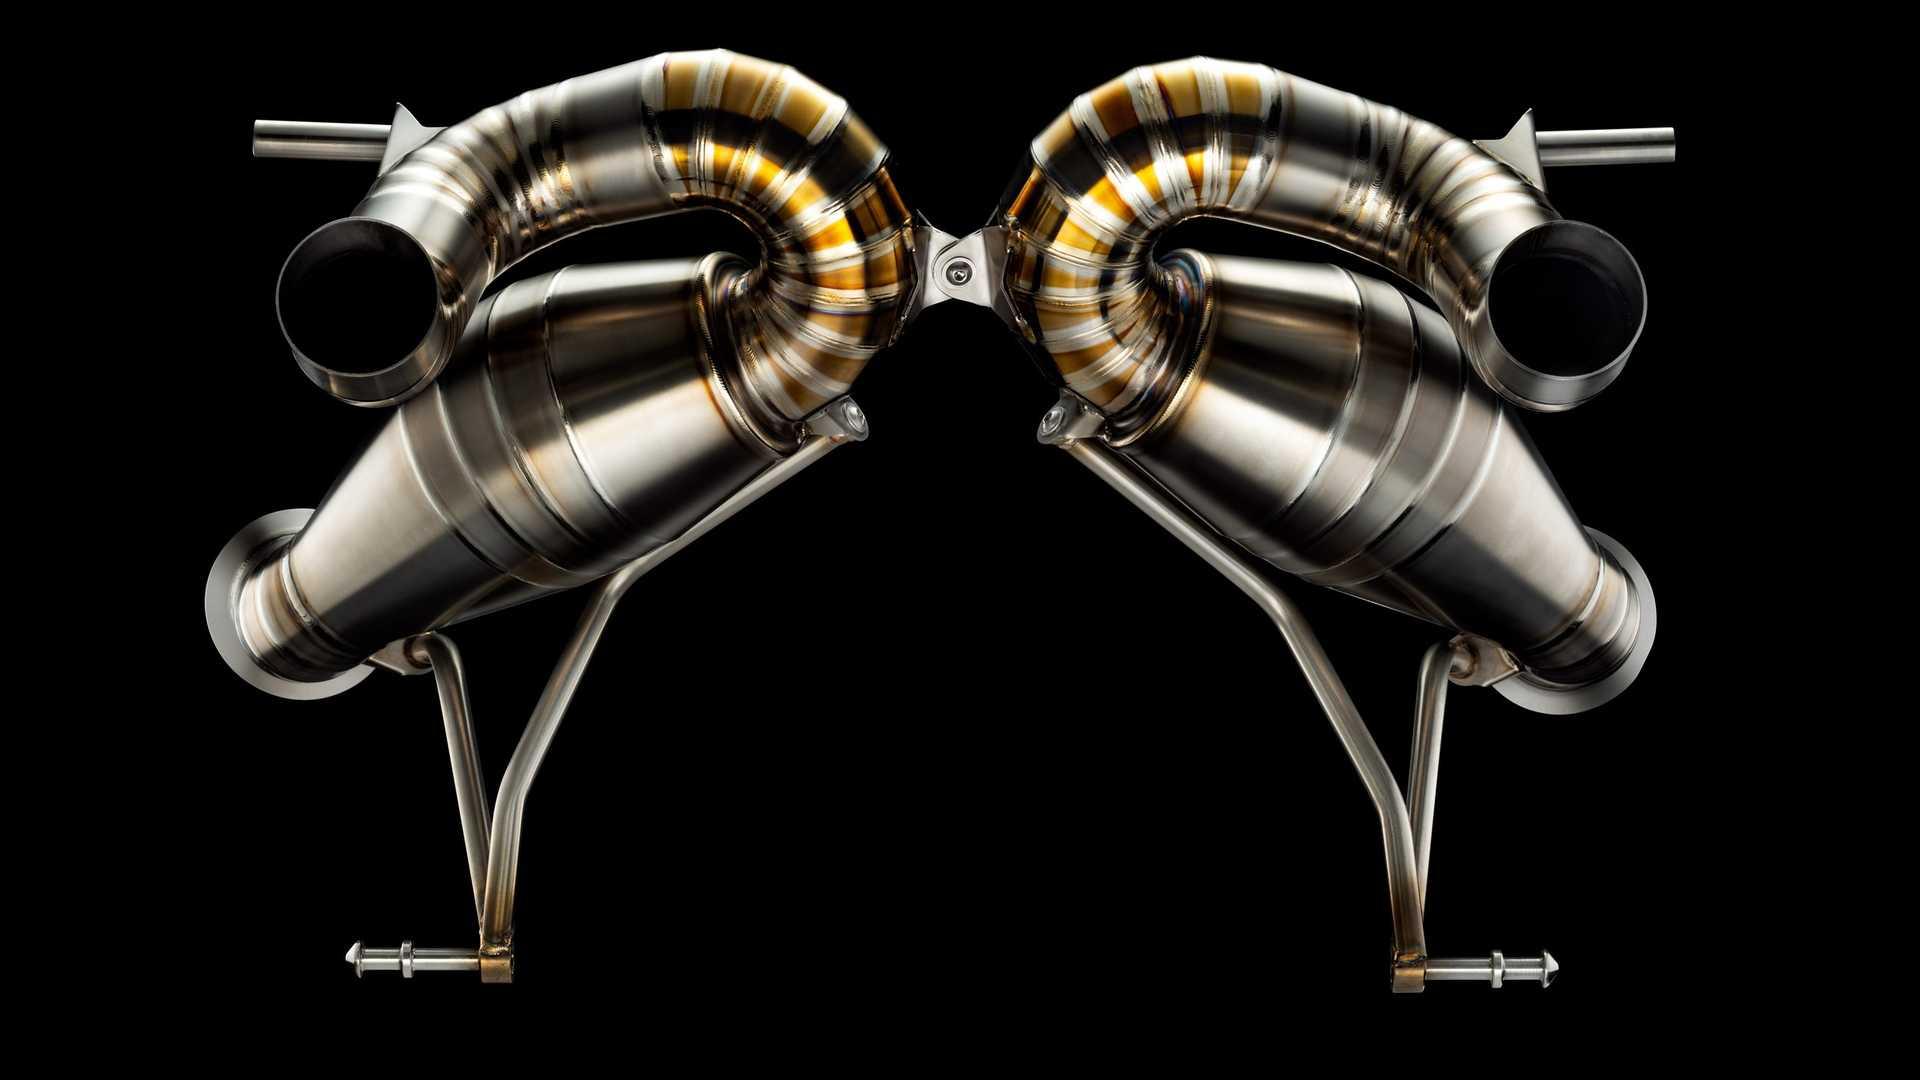 Valentino Balbon Lamborghini Aventador SVJ Exhaust 2